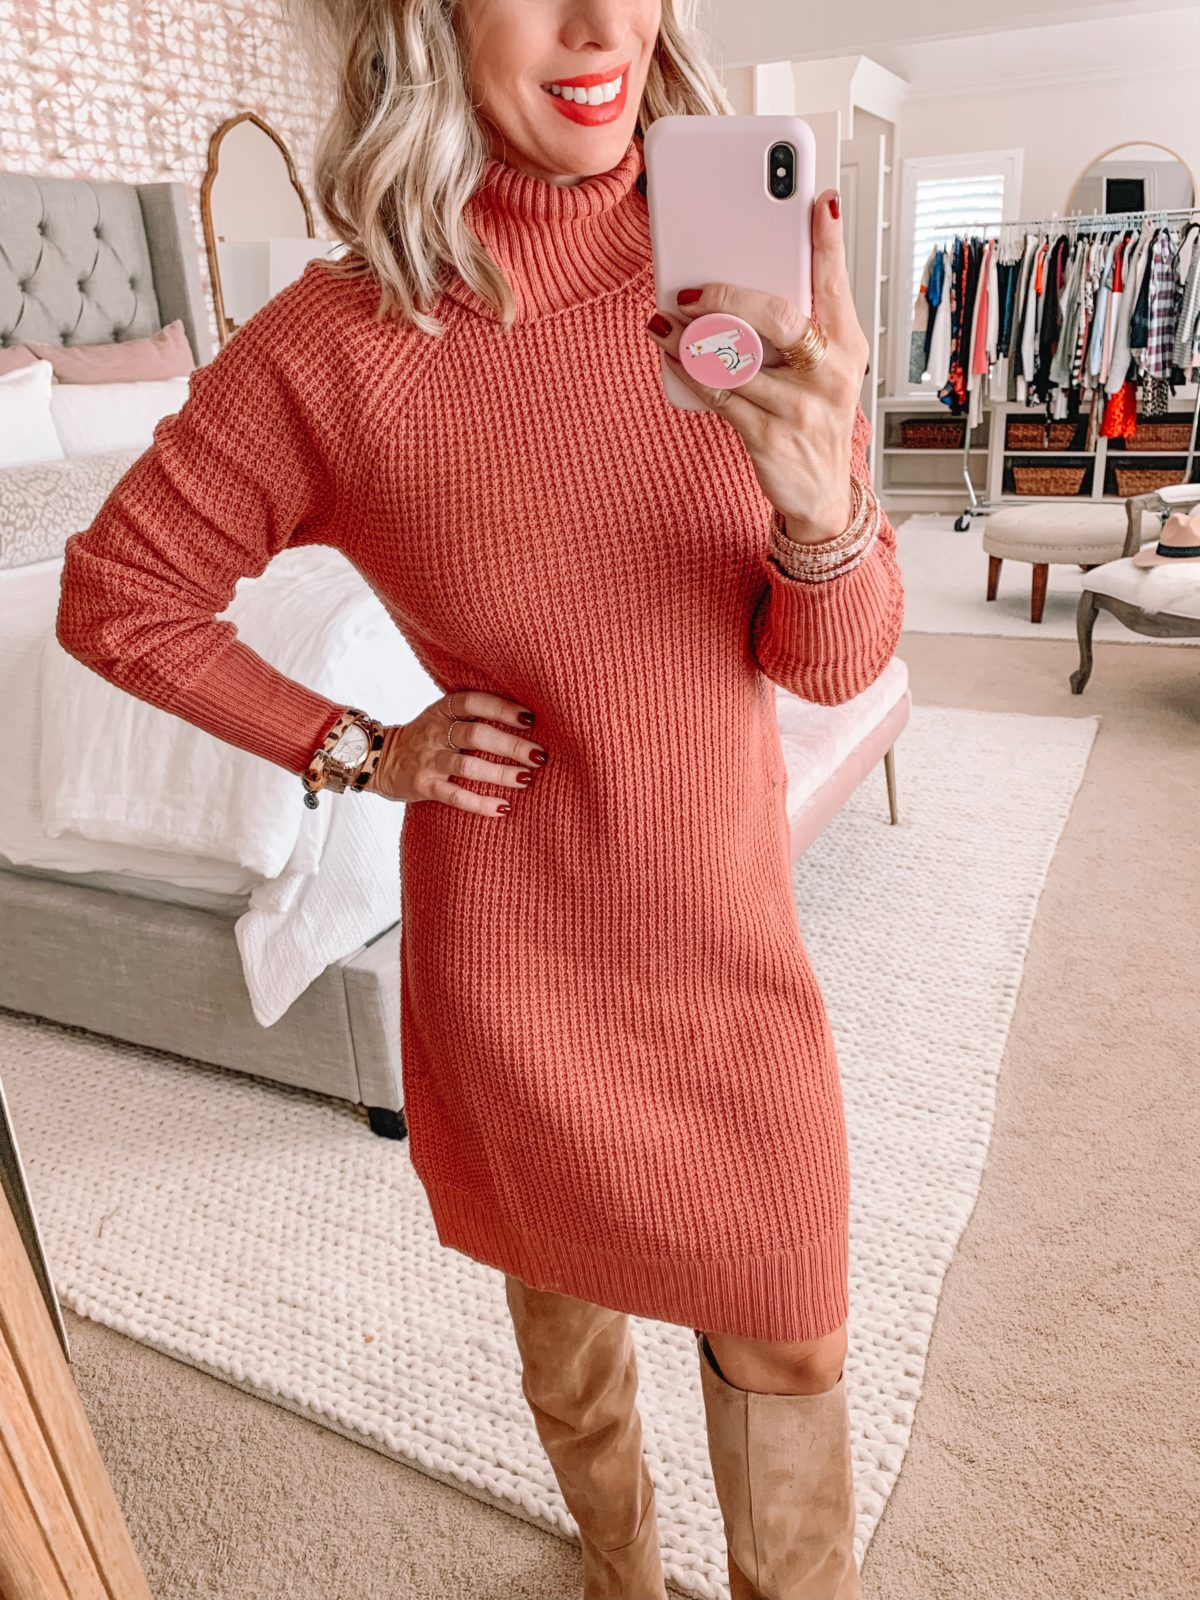 Amazon Prime Fashion- Sweater Dress